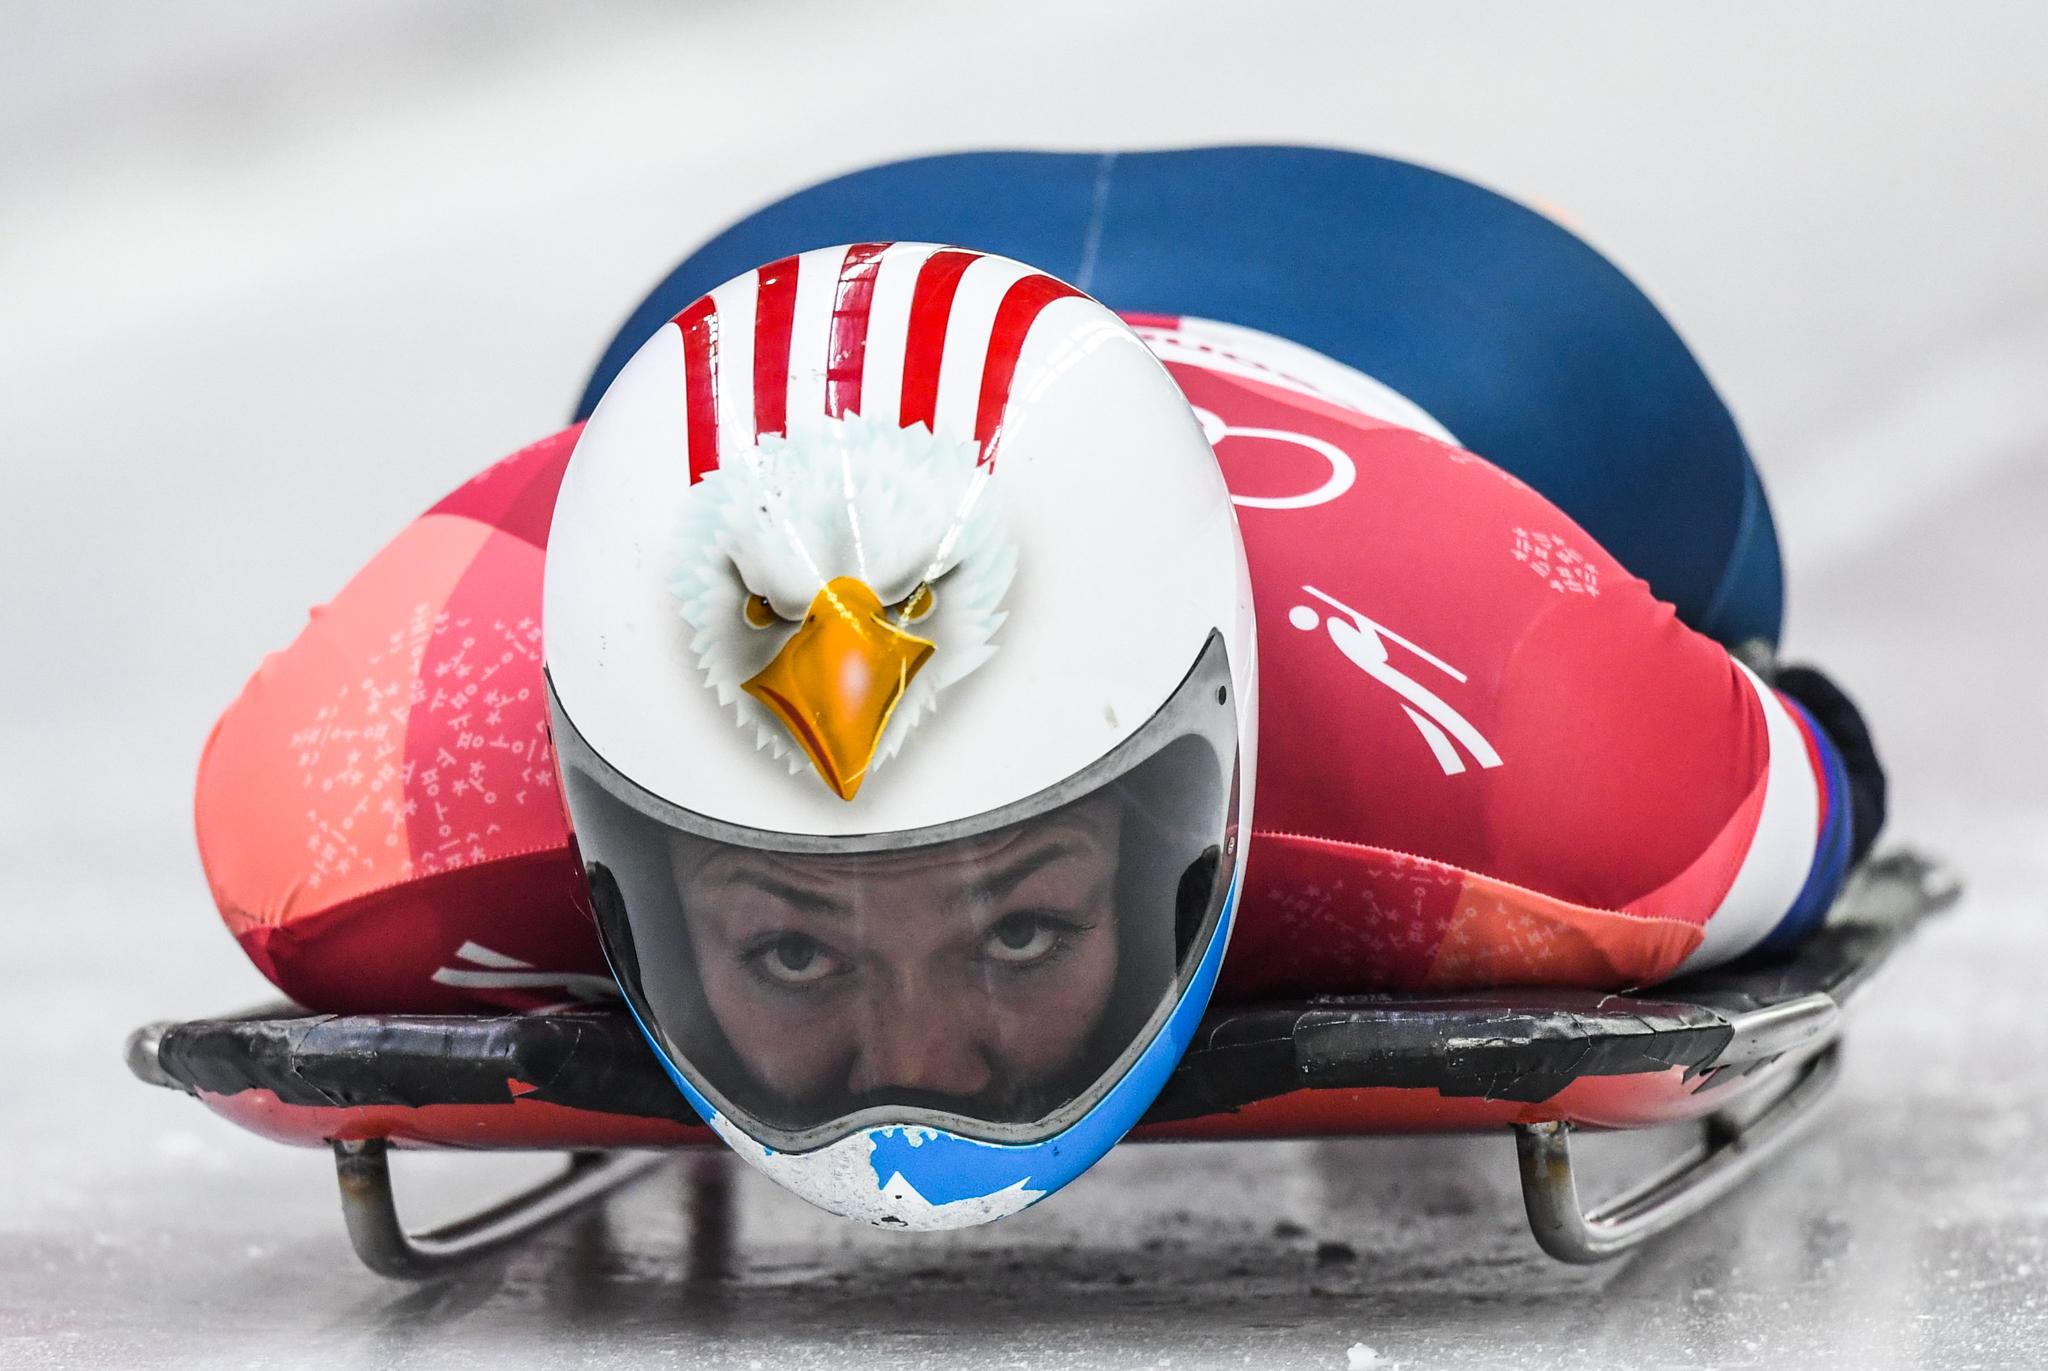 Atleta de trenó descendo trilha de barriga pra baixo (© Mark Ralston/AFP/Getty Images)